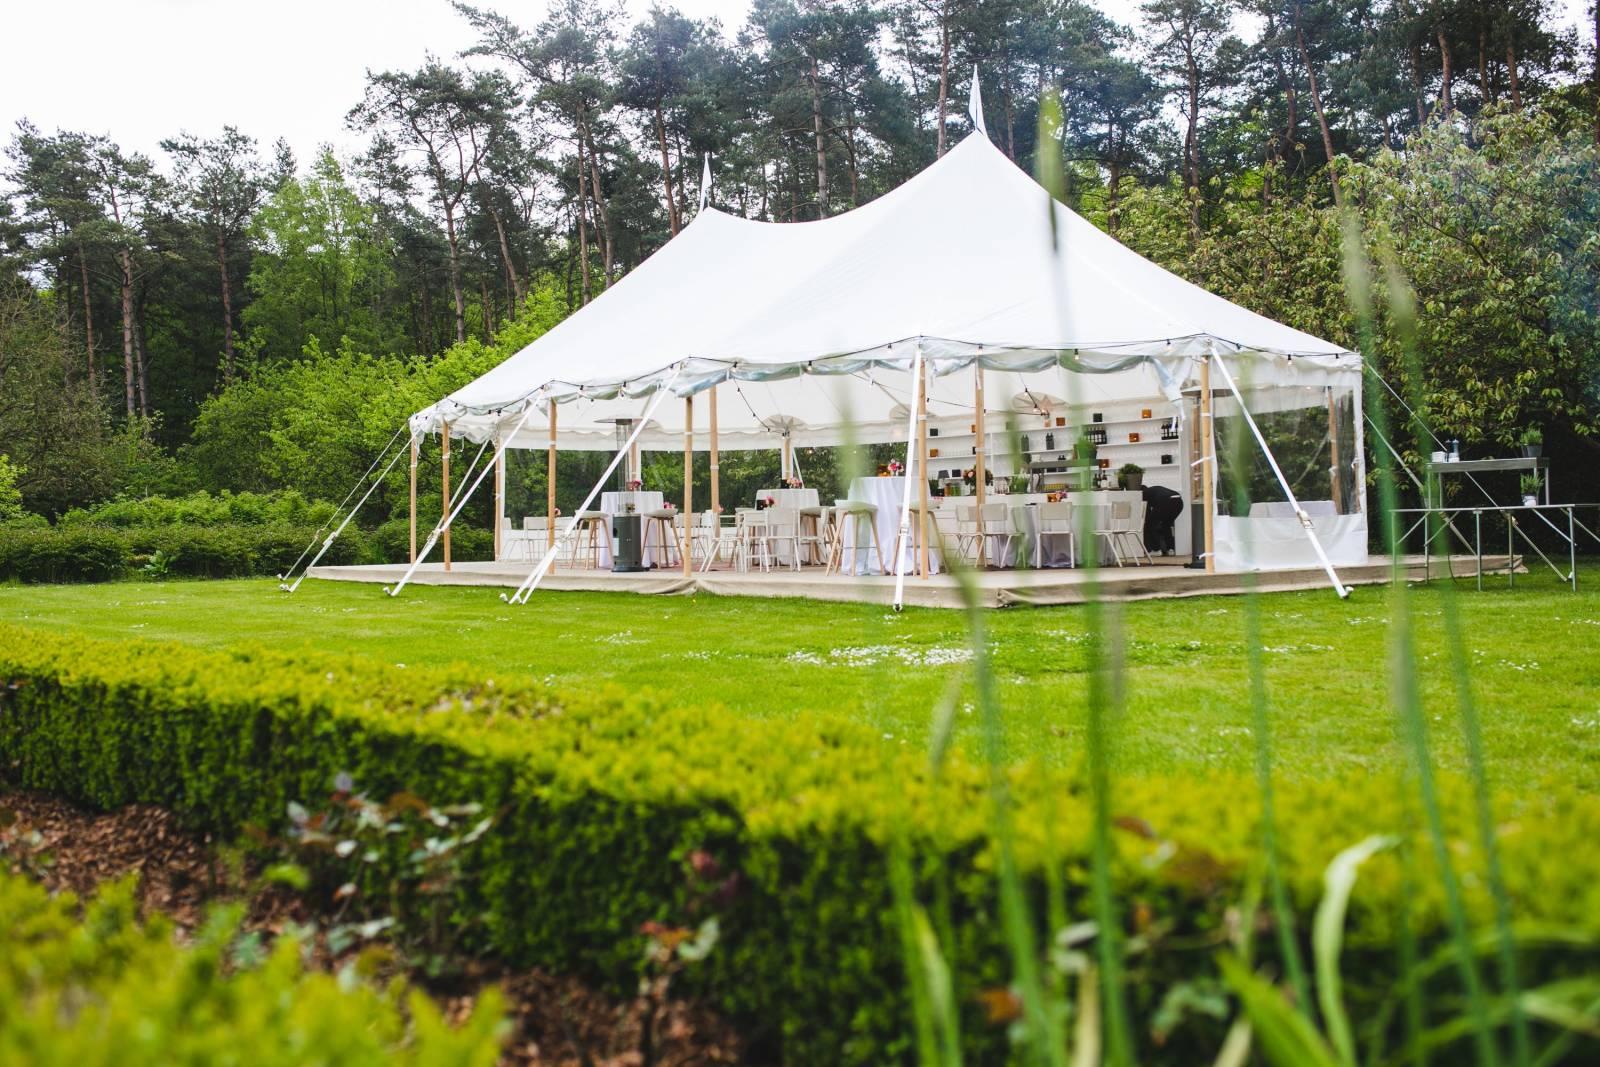 Wolvenbos - House of Weddings  - 4